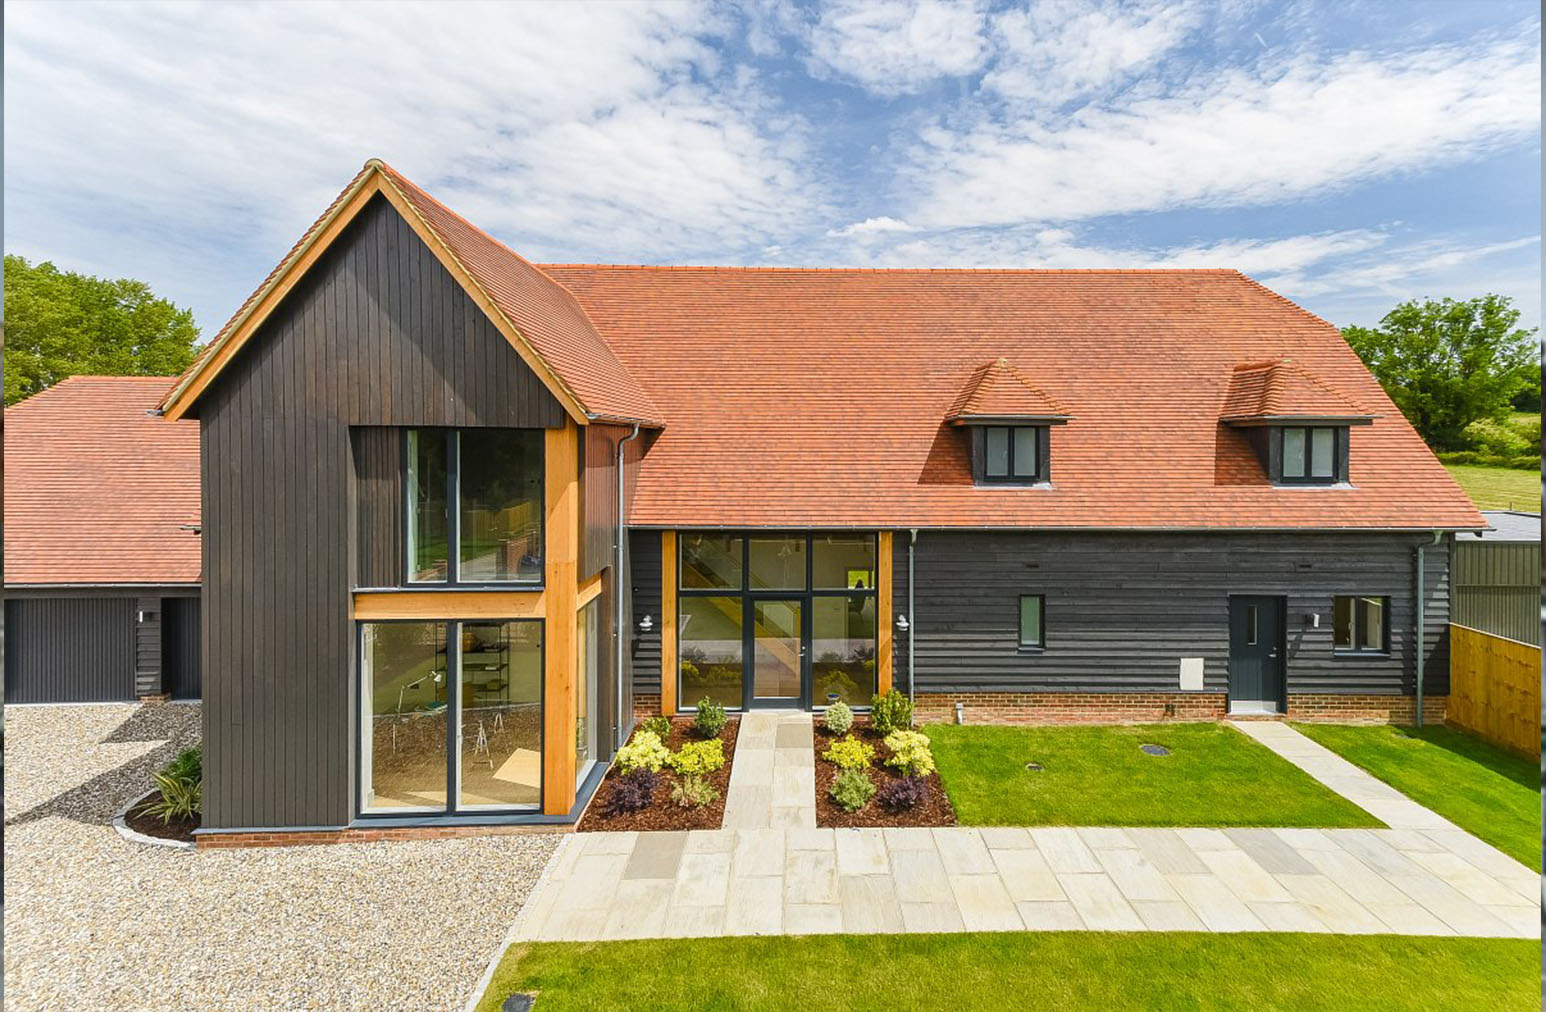 belmark homes - detached houses - developers